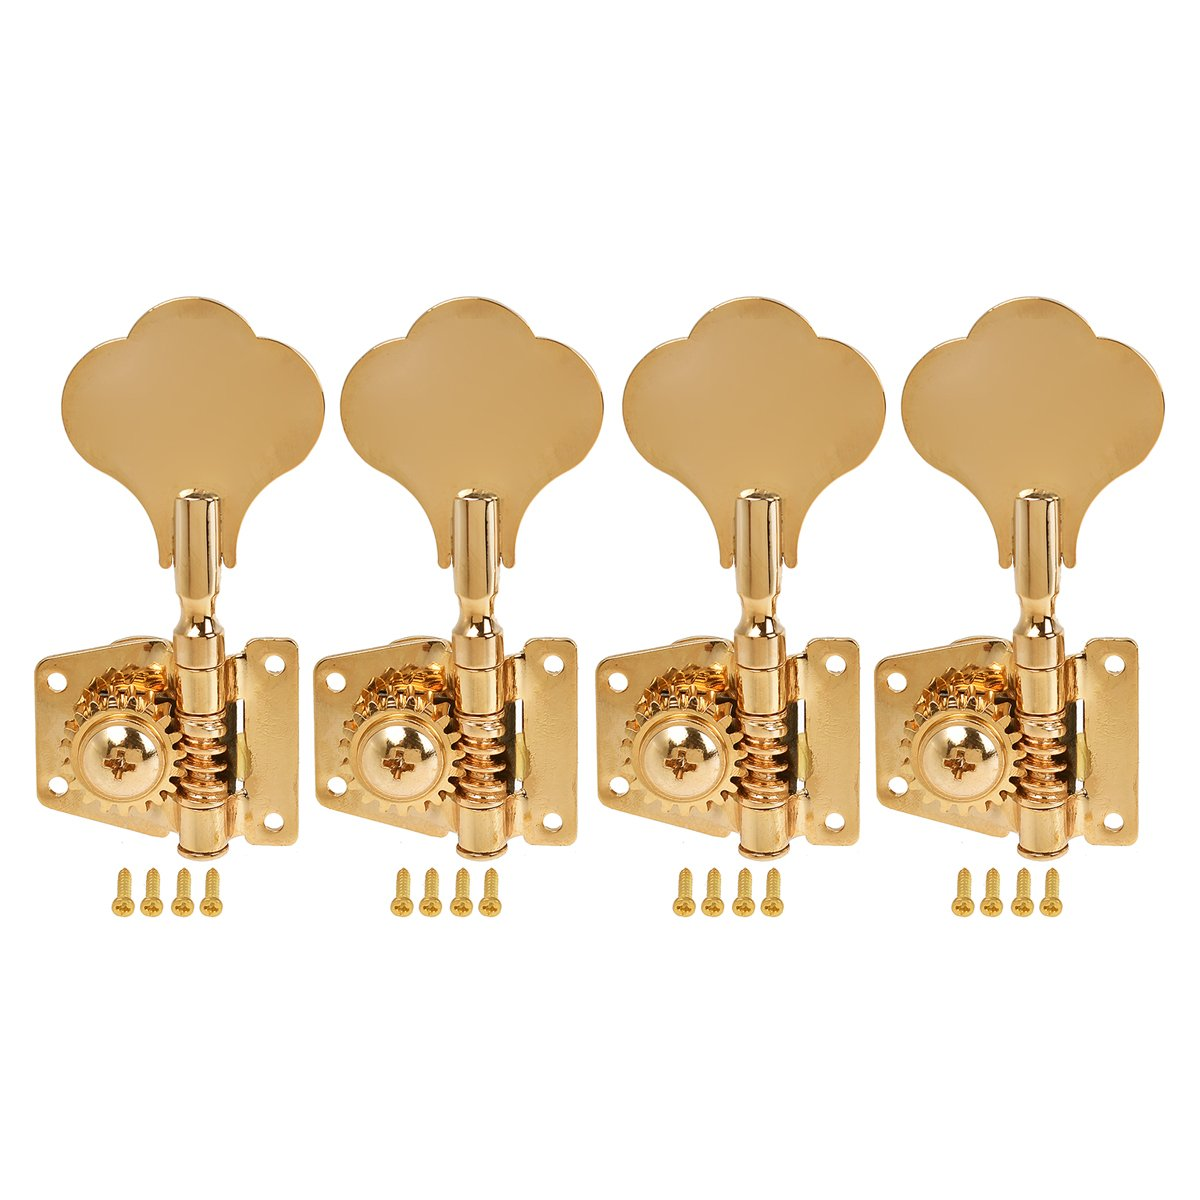 Kmise 5 String Bass Electric Guitar Tuners Tuning Pegs Keys Machine Heads Open Gear 4R1L Gold 1 Set (MI1512)